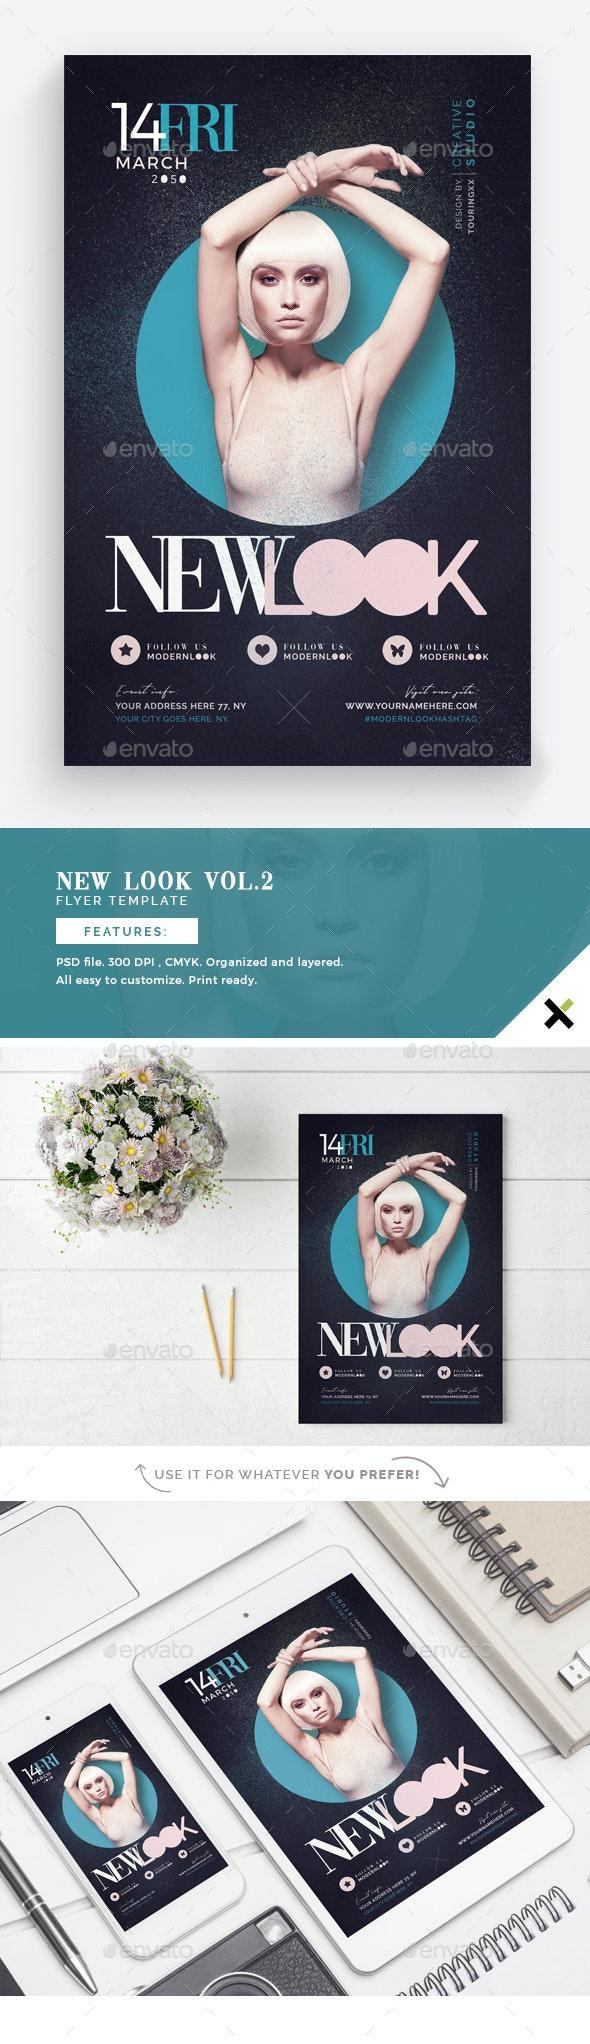 New Look Vol Flyer Template - Flyers Print Templates